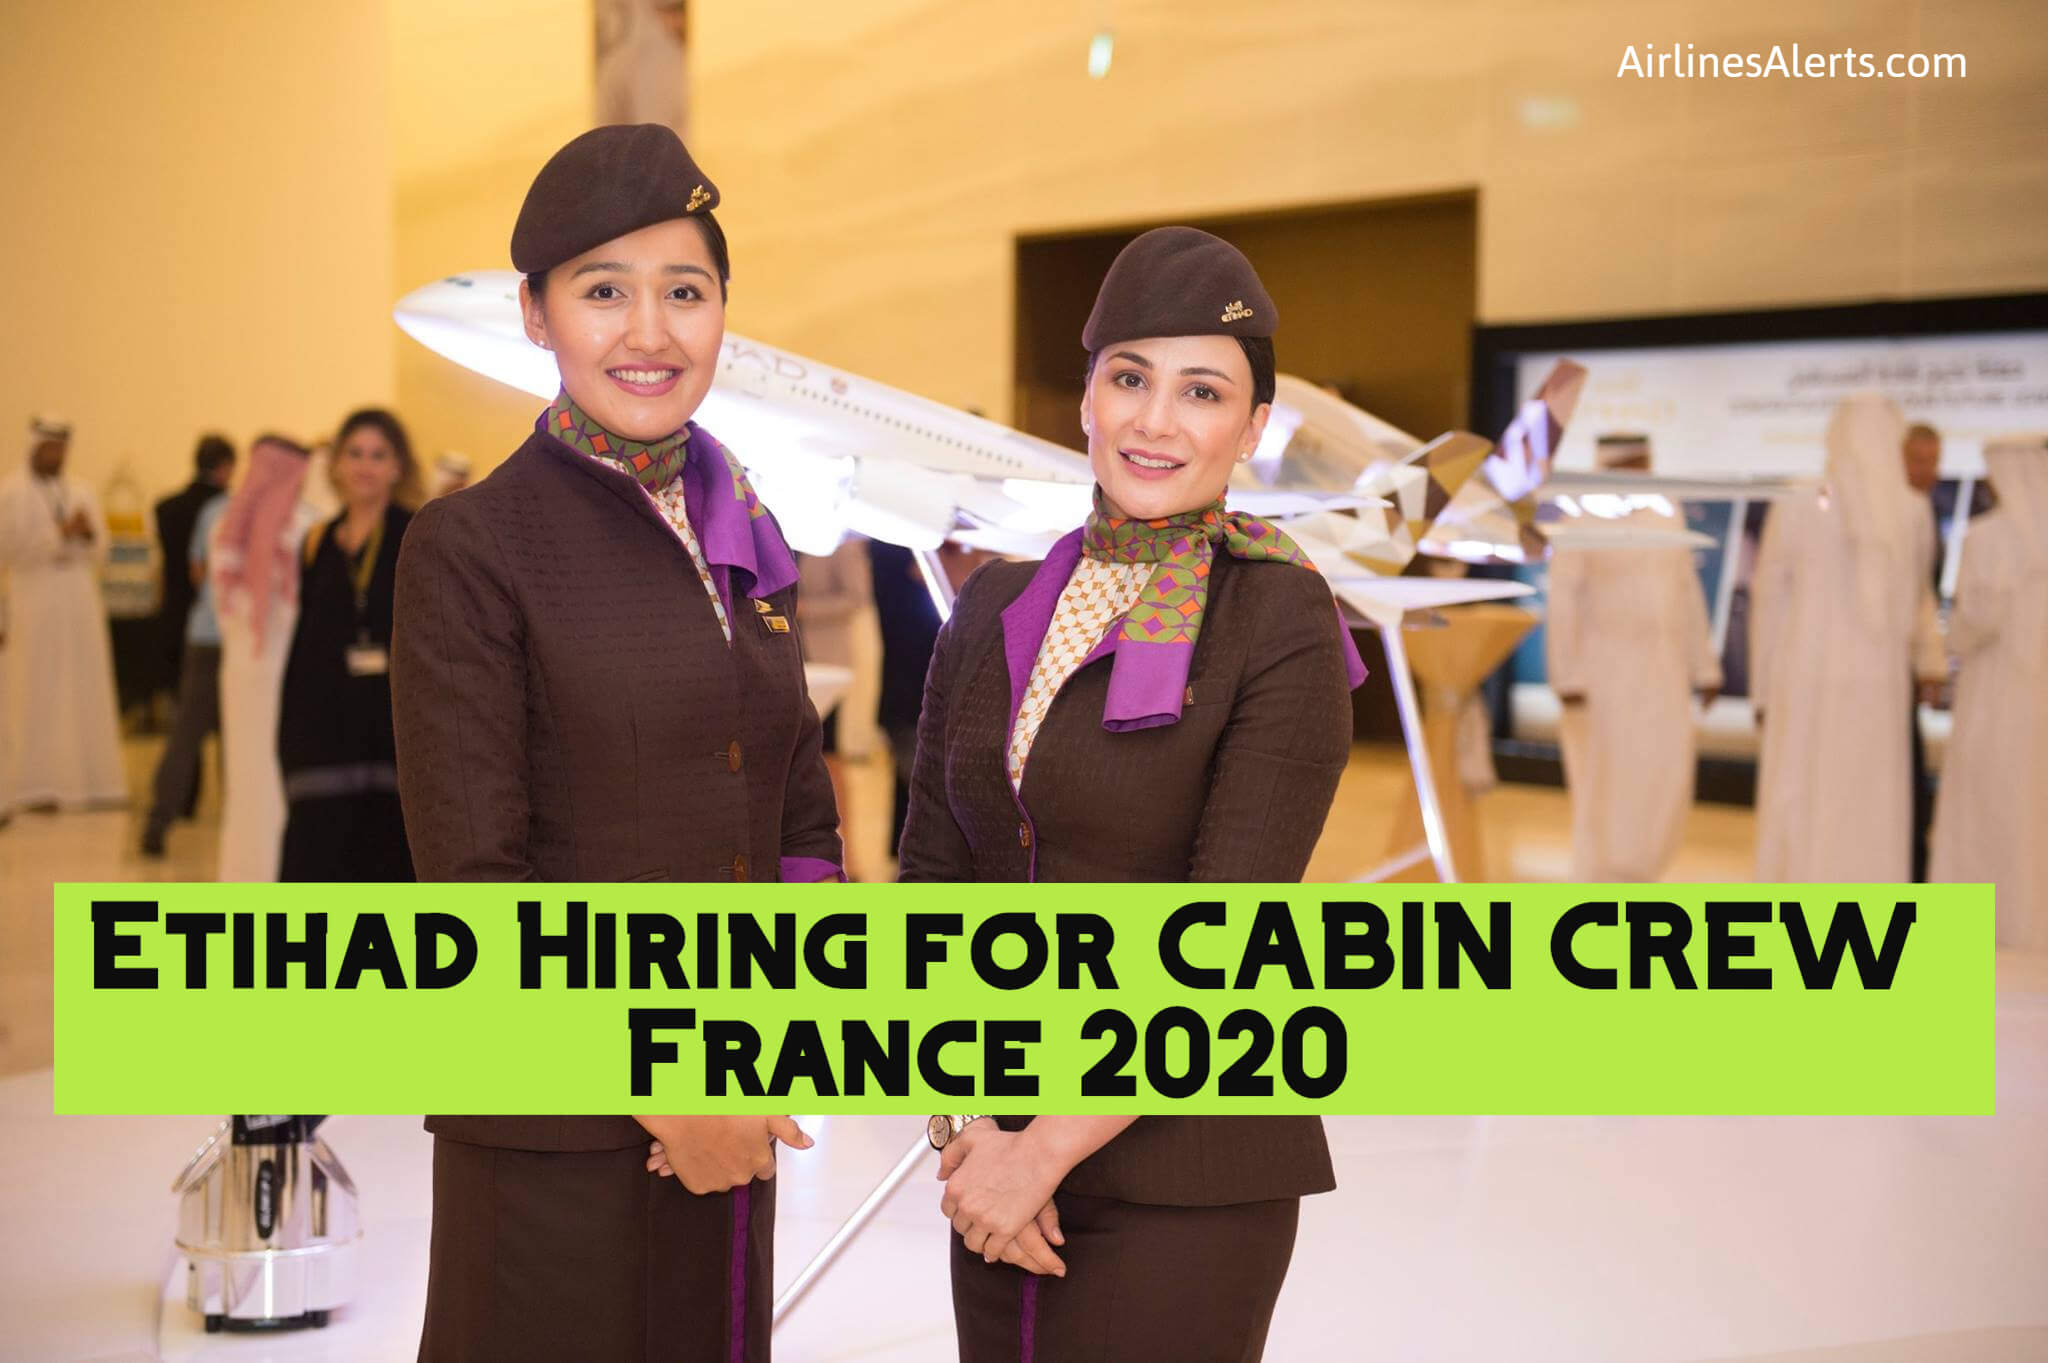 Etihad Cabin Crew France Recruitment 2020 - Apply Online